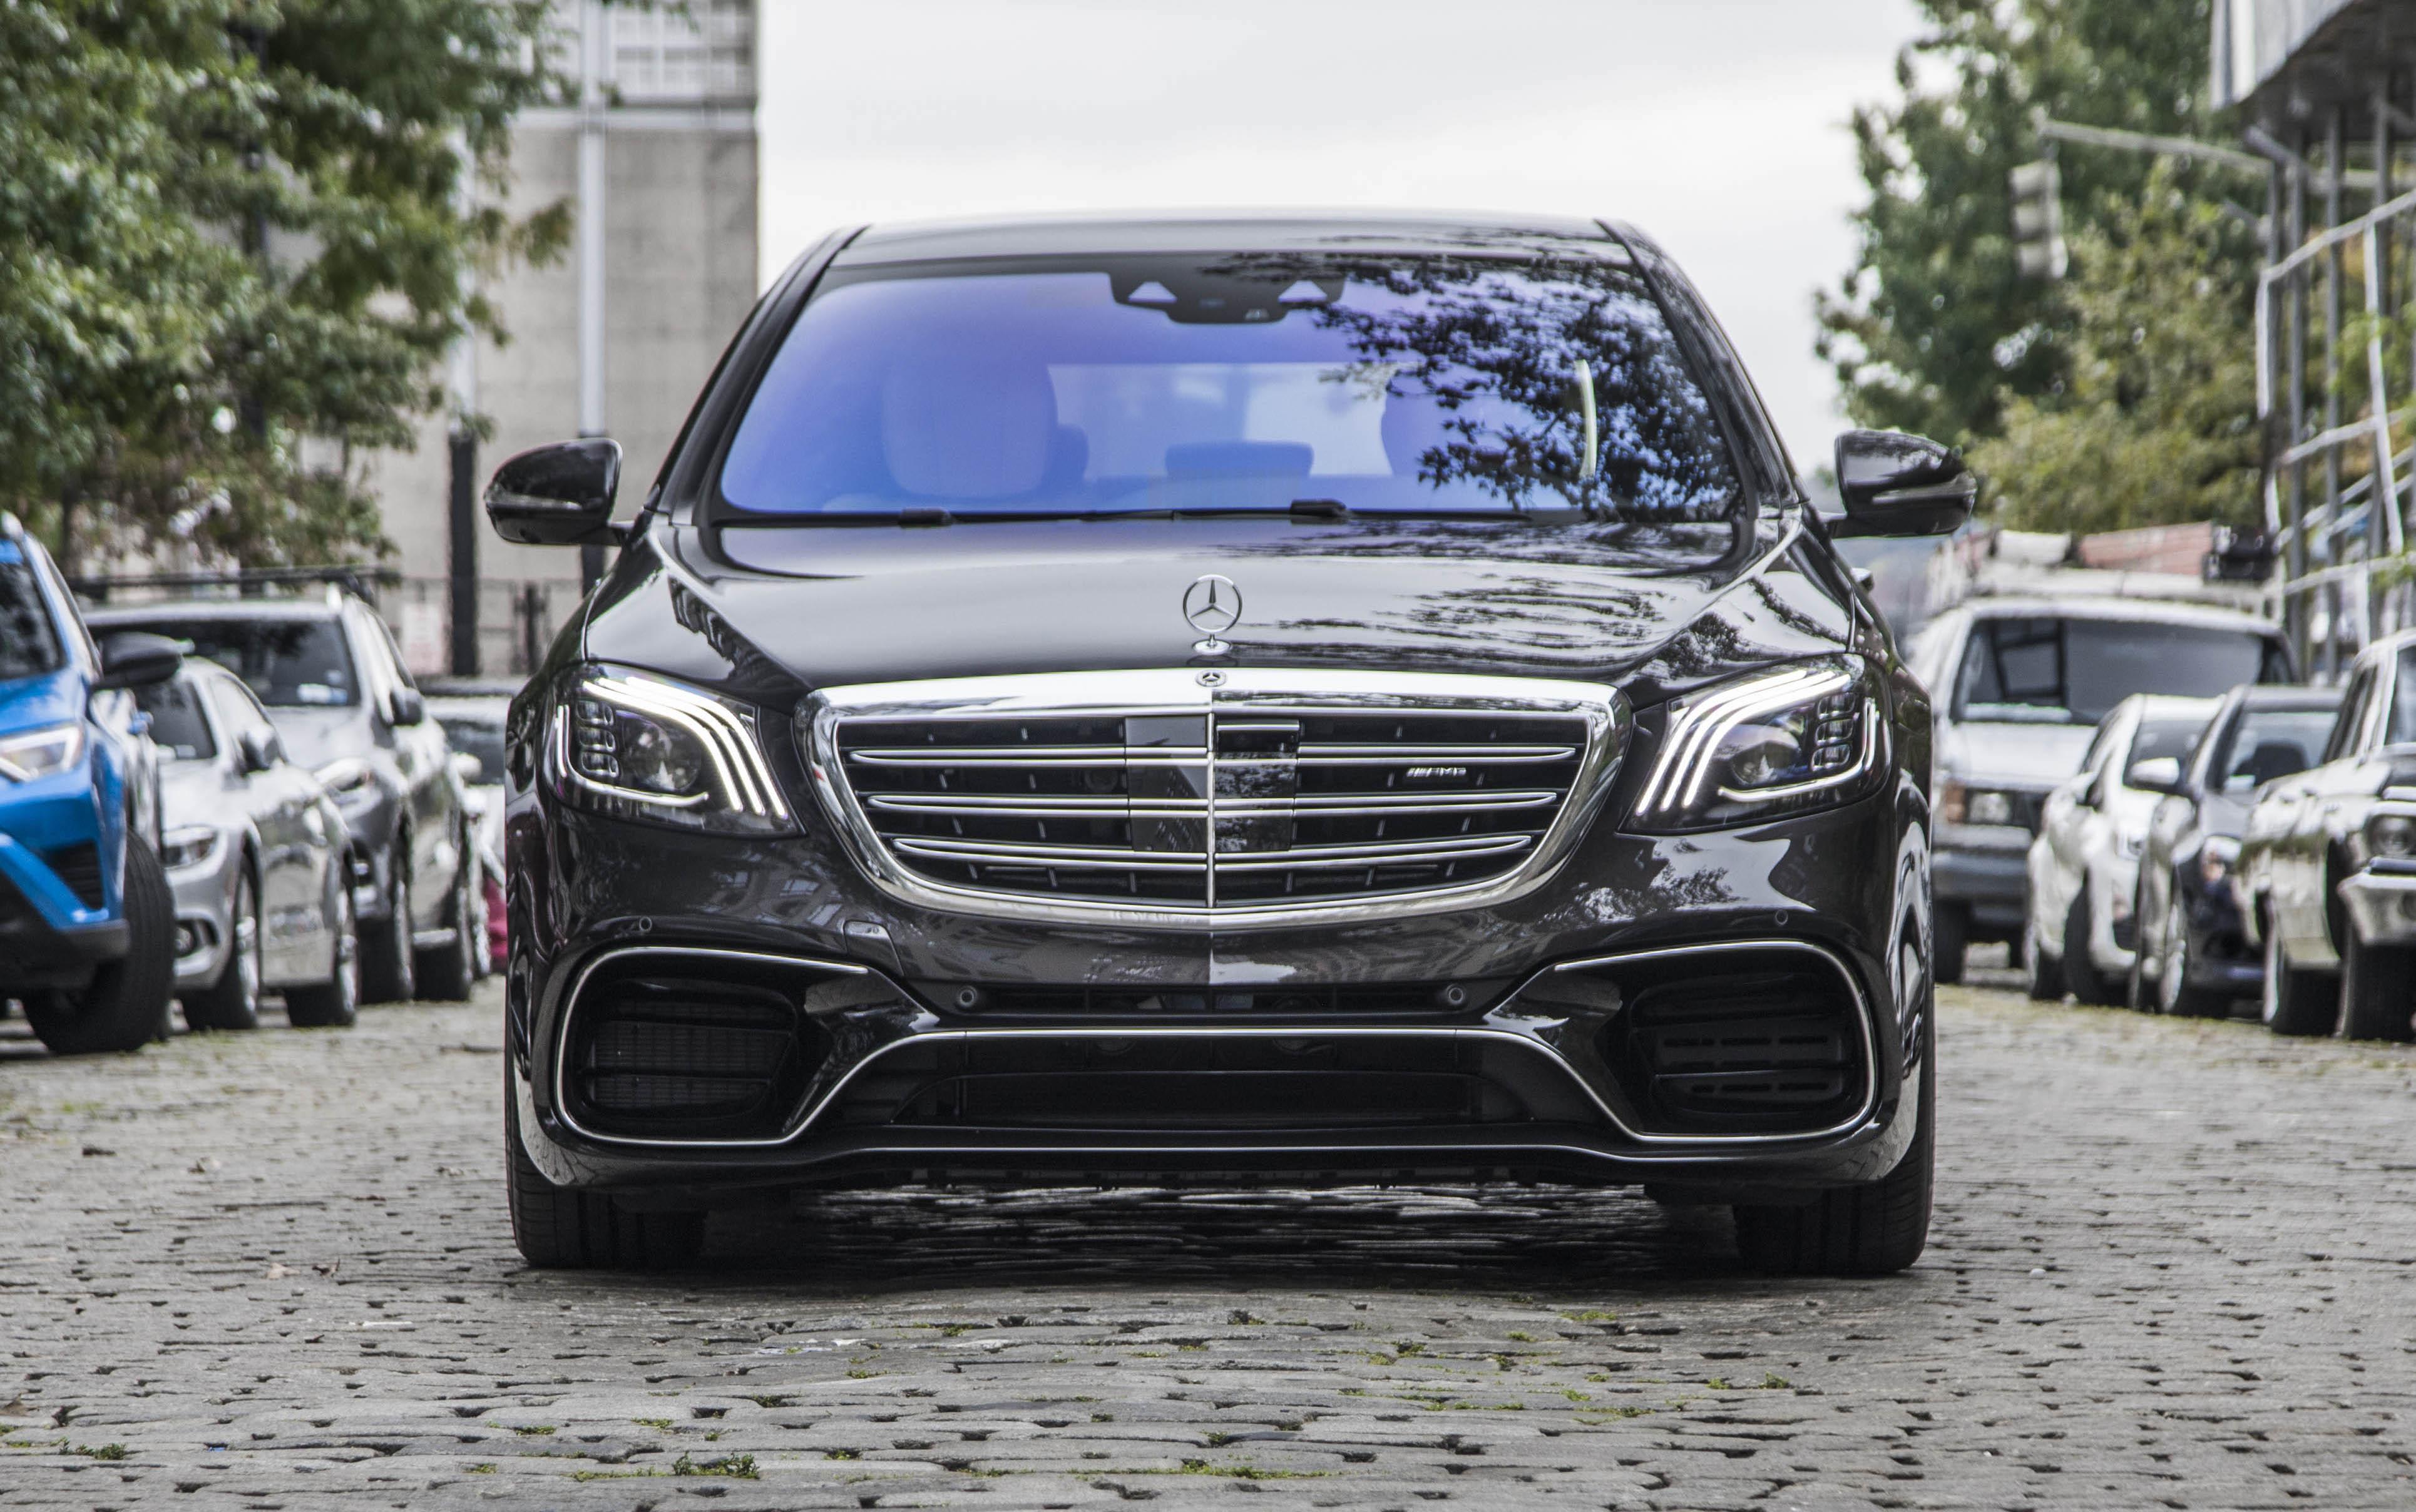 A black Mercedes-Benz S-Class sedan on a cobblestone street